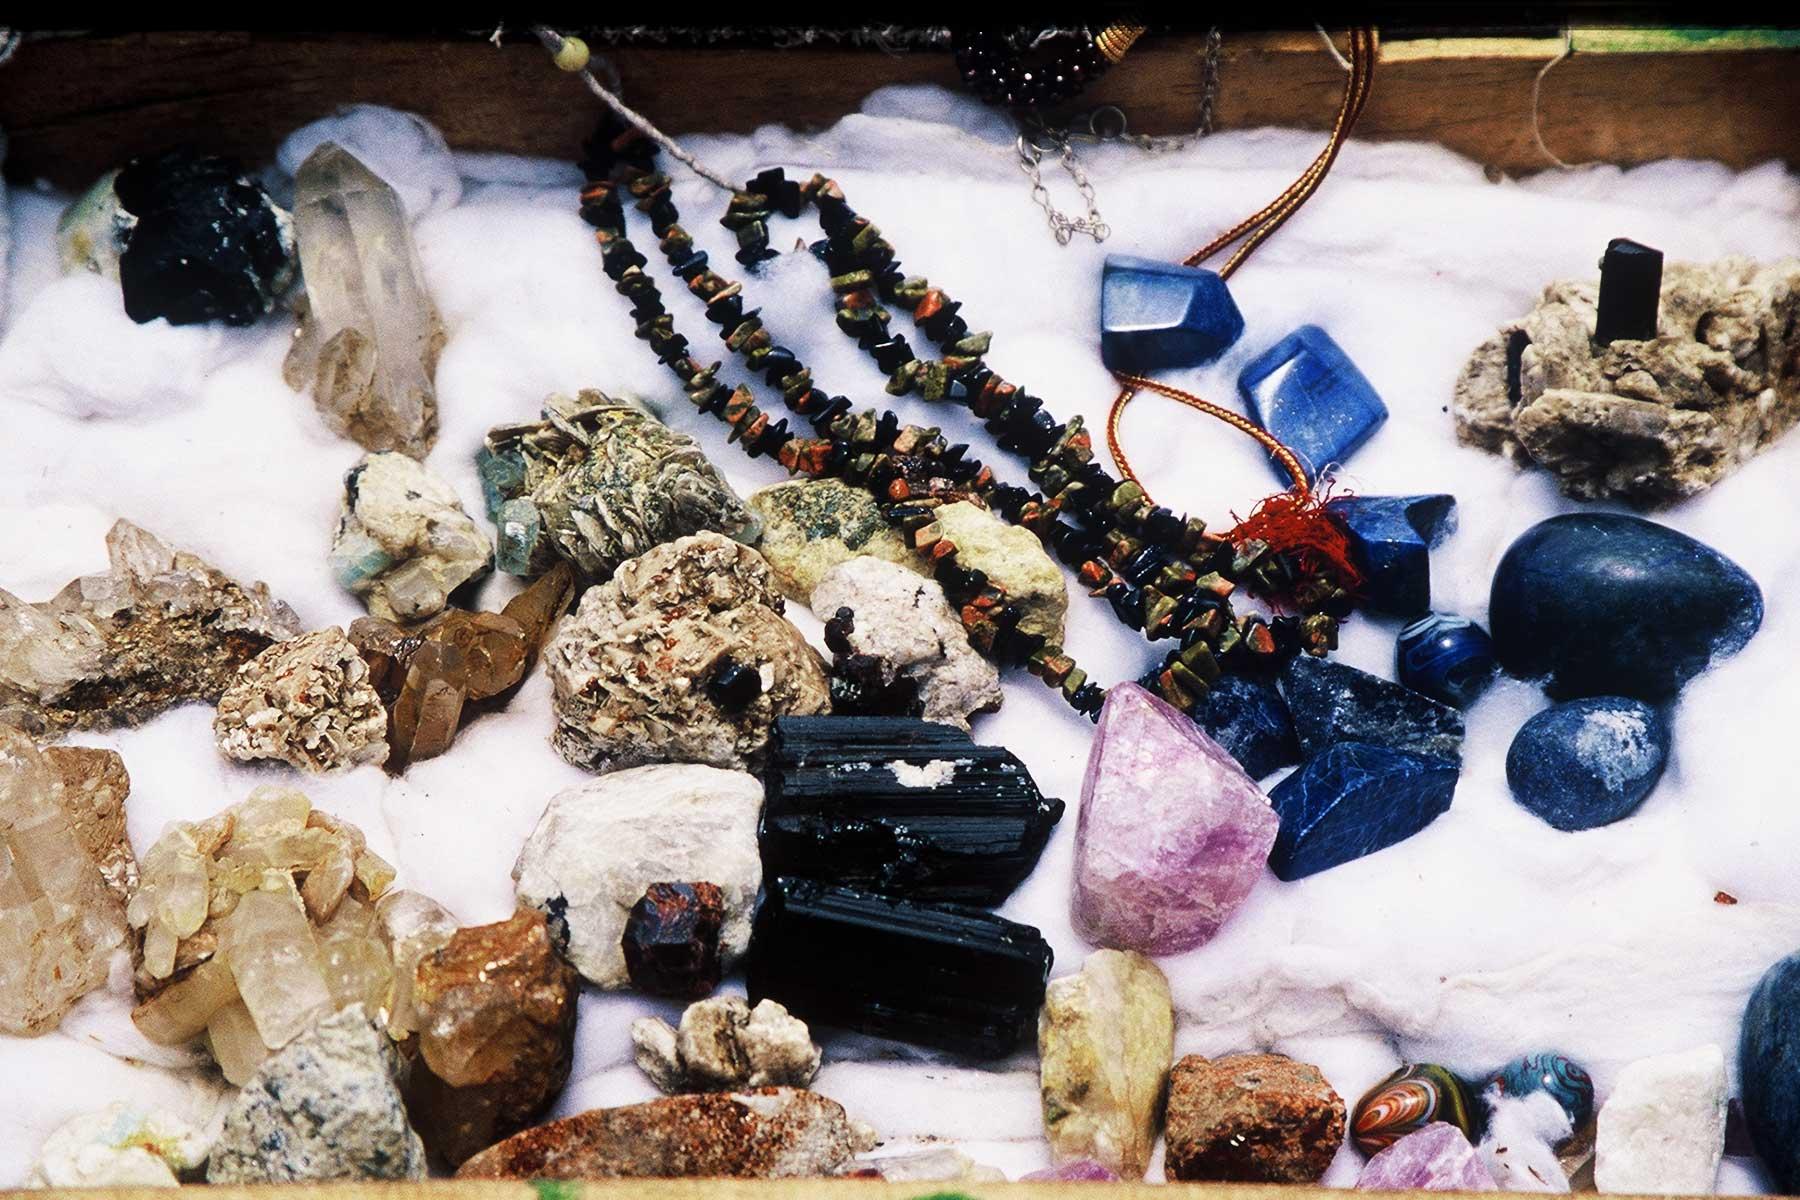 Nanga Parabat Gem Stones - Pakistan Photo Journal - Steven A Martin - Silk Road Research